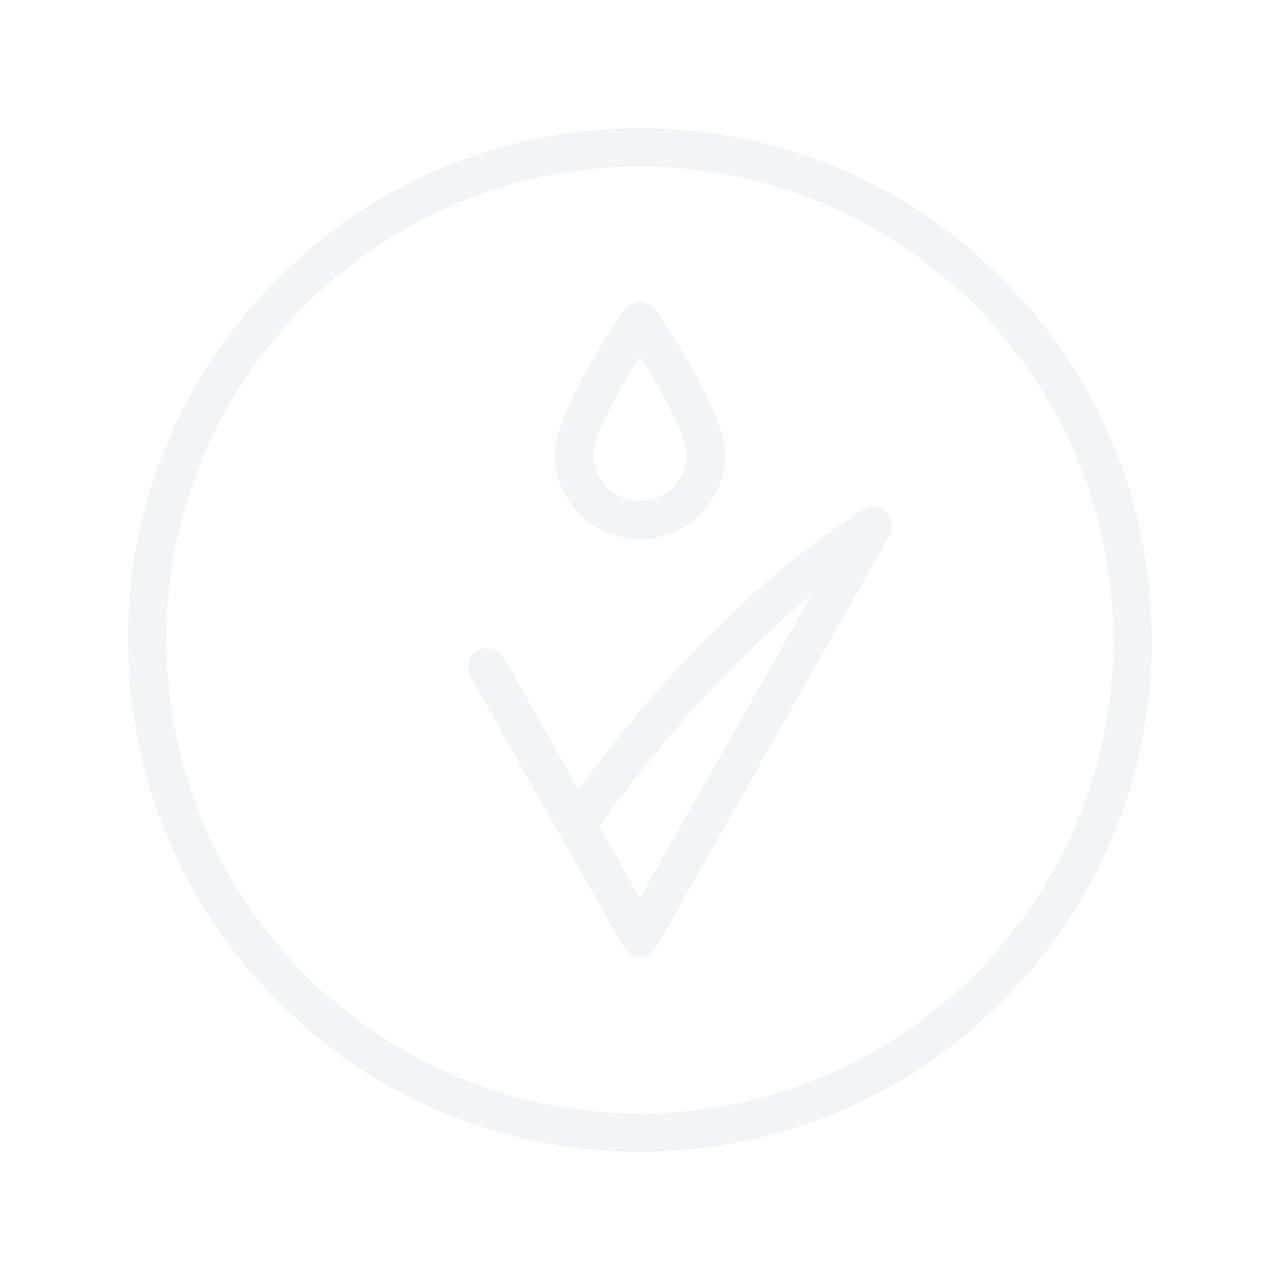 SHISEIDO Waso Color-Smart Day Moisturizer SPF30 50ml